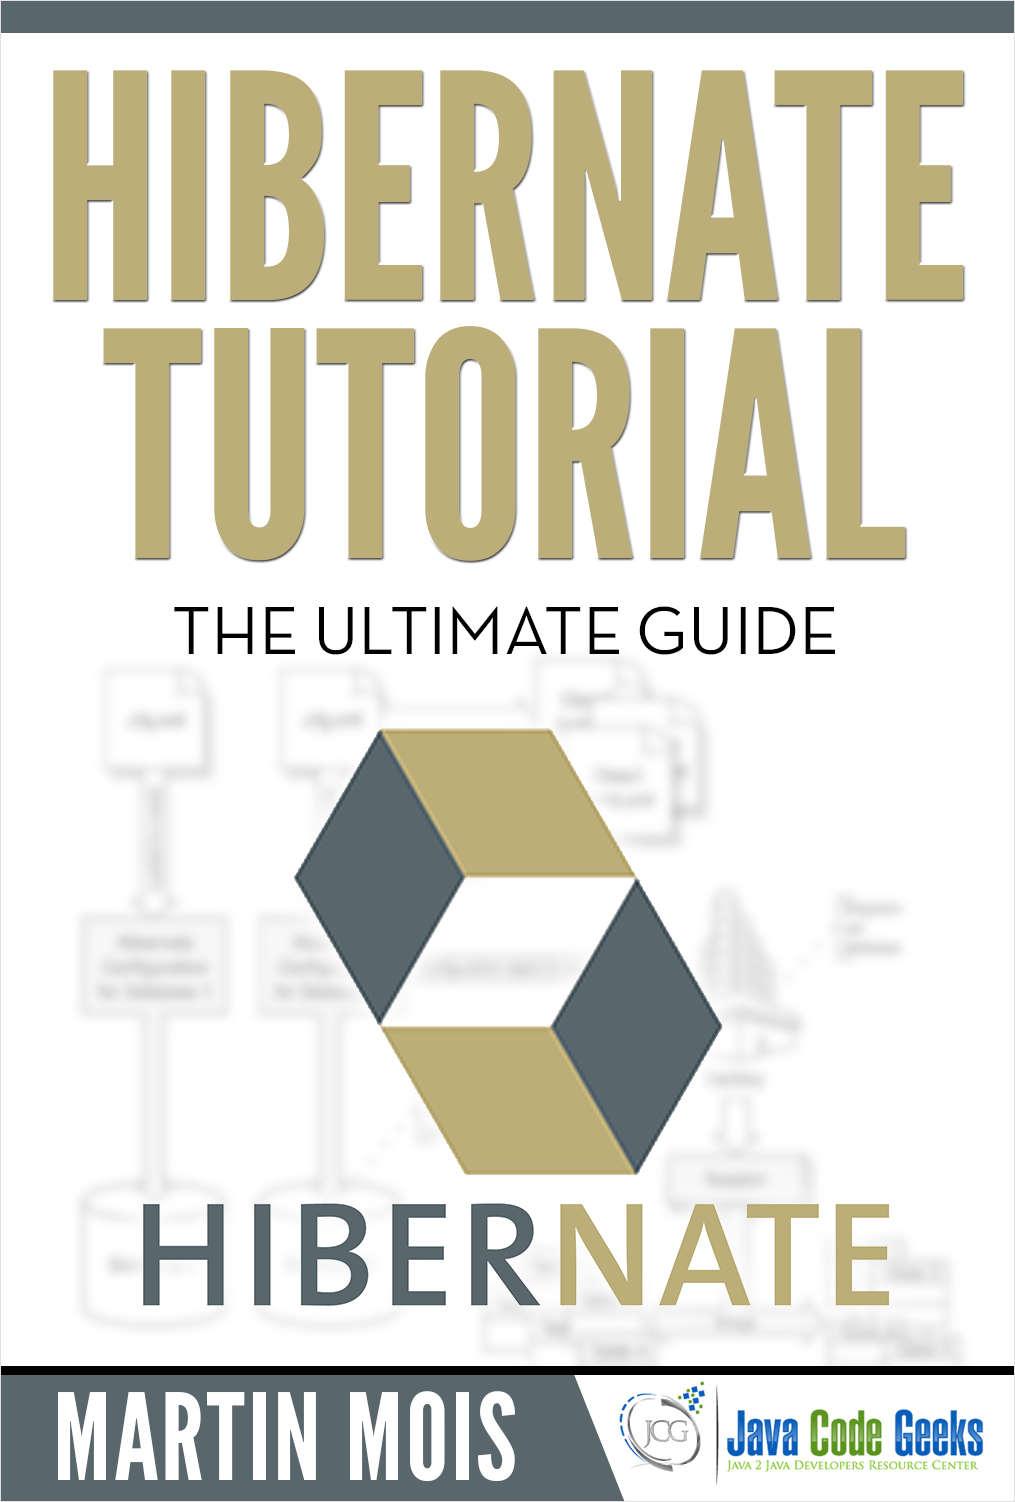 Hibernate tutorial free java code geeks ebook baditri Gallery